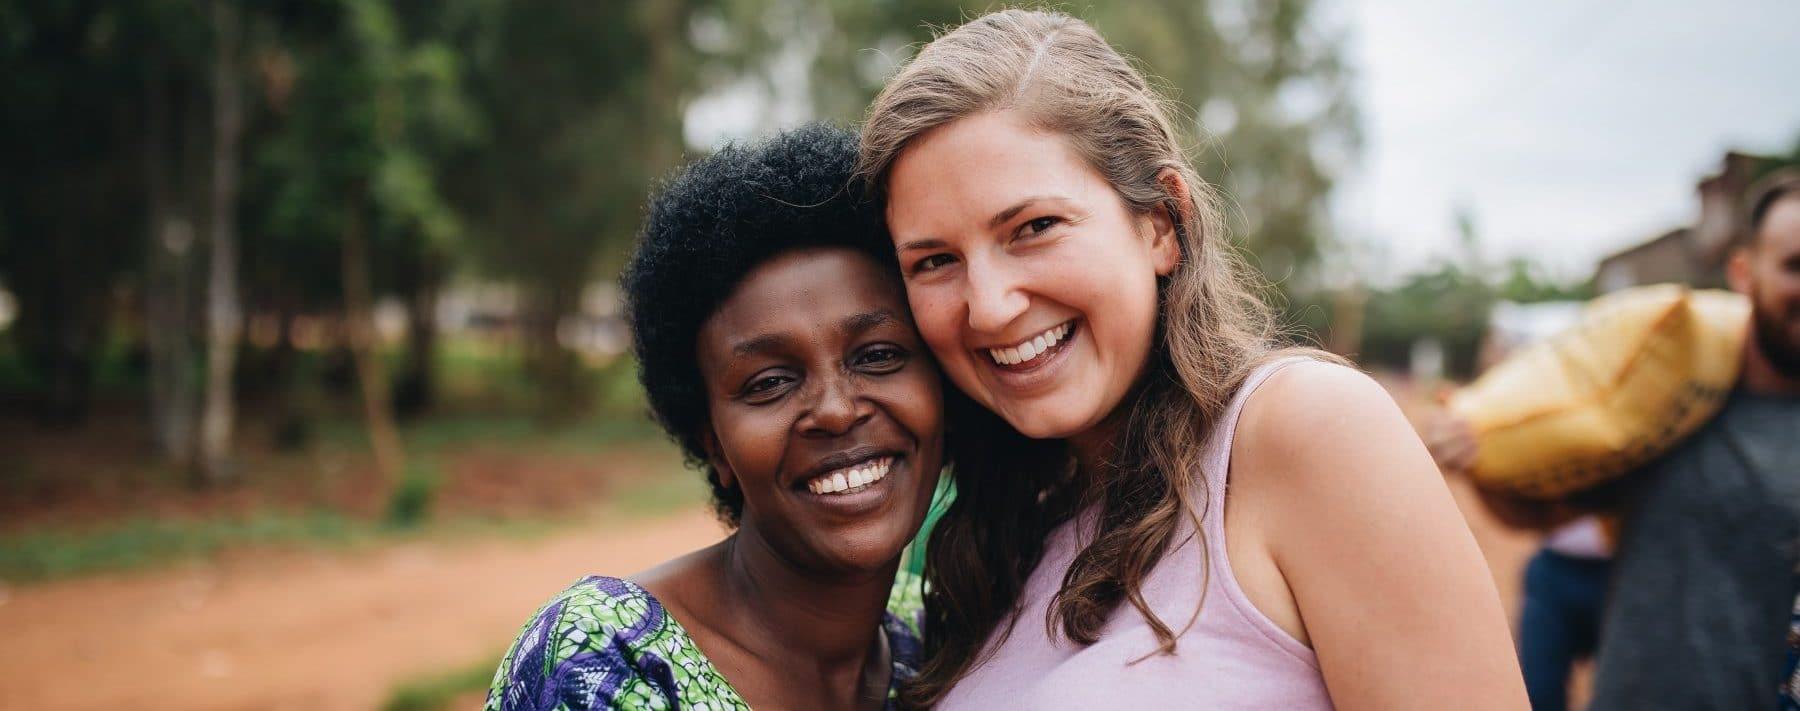 Rwandan and American women together